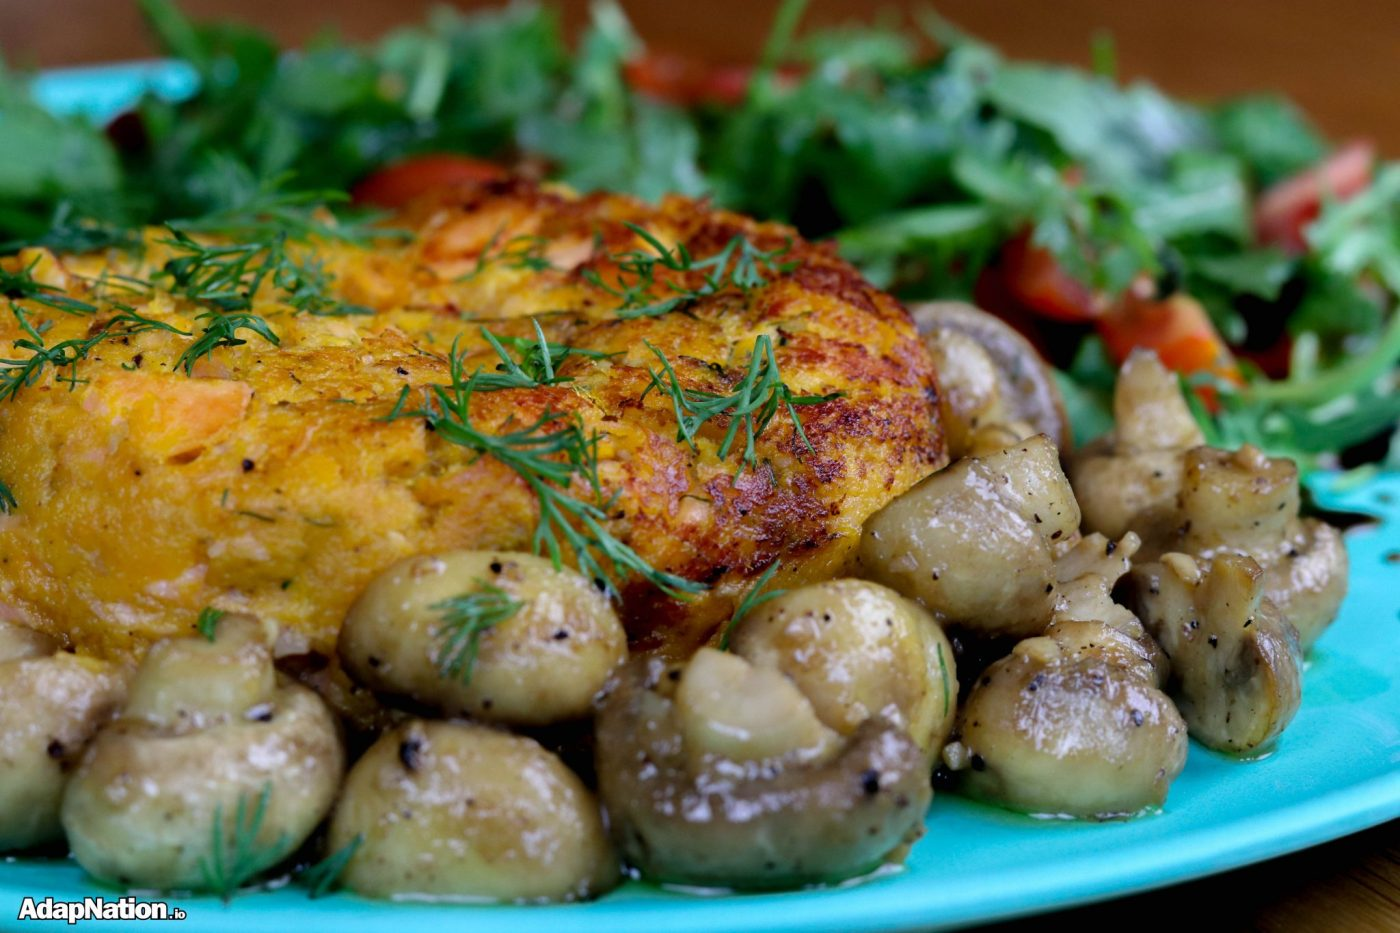 Juicy Sweet Potato Salmon Fishcake, Button Mushrooms & Rocket Salad